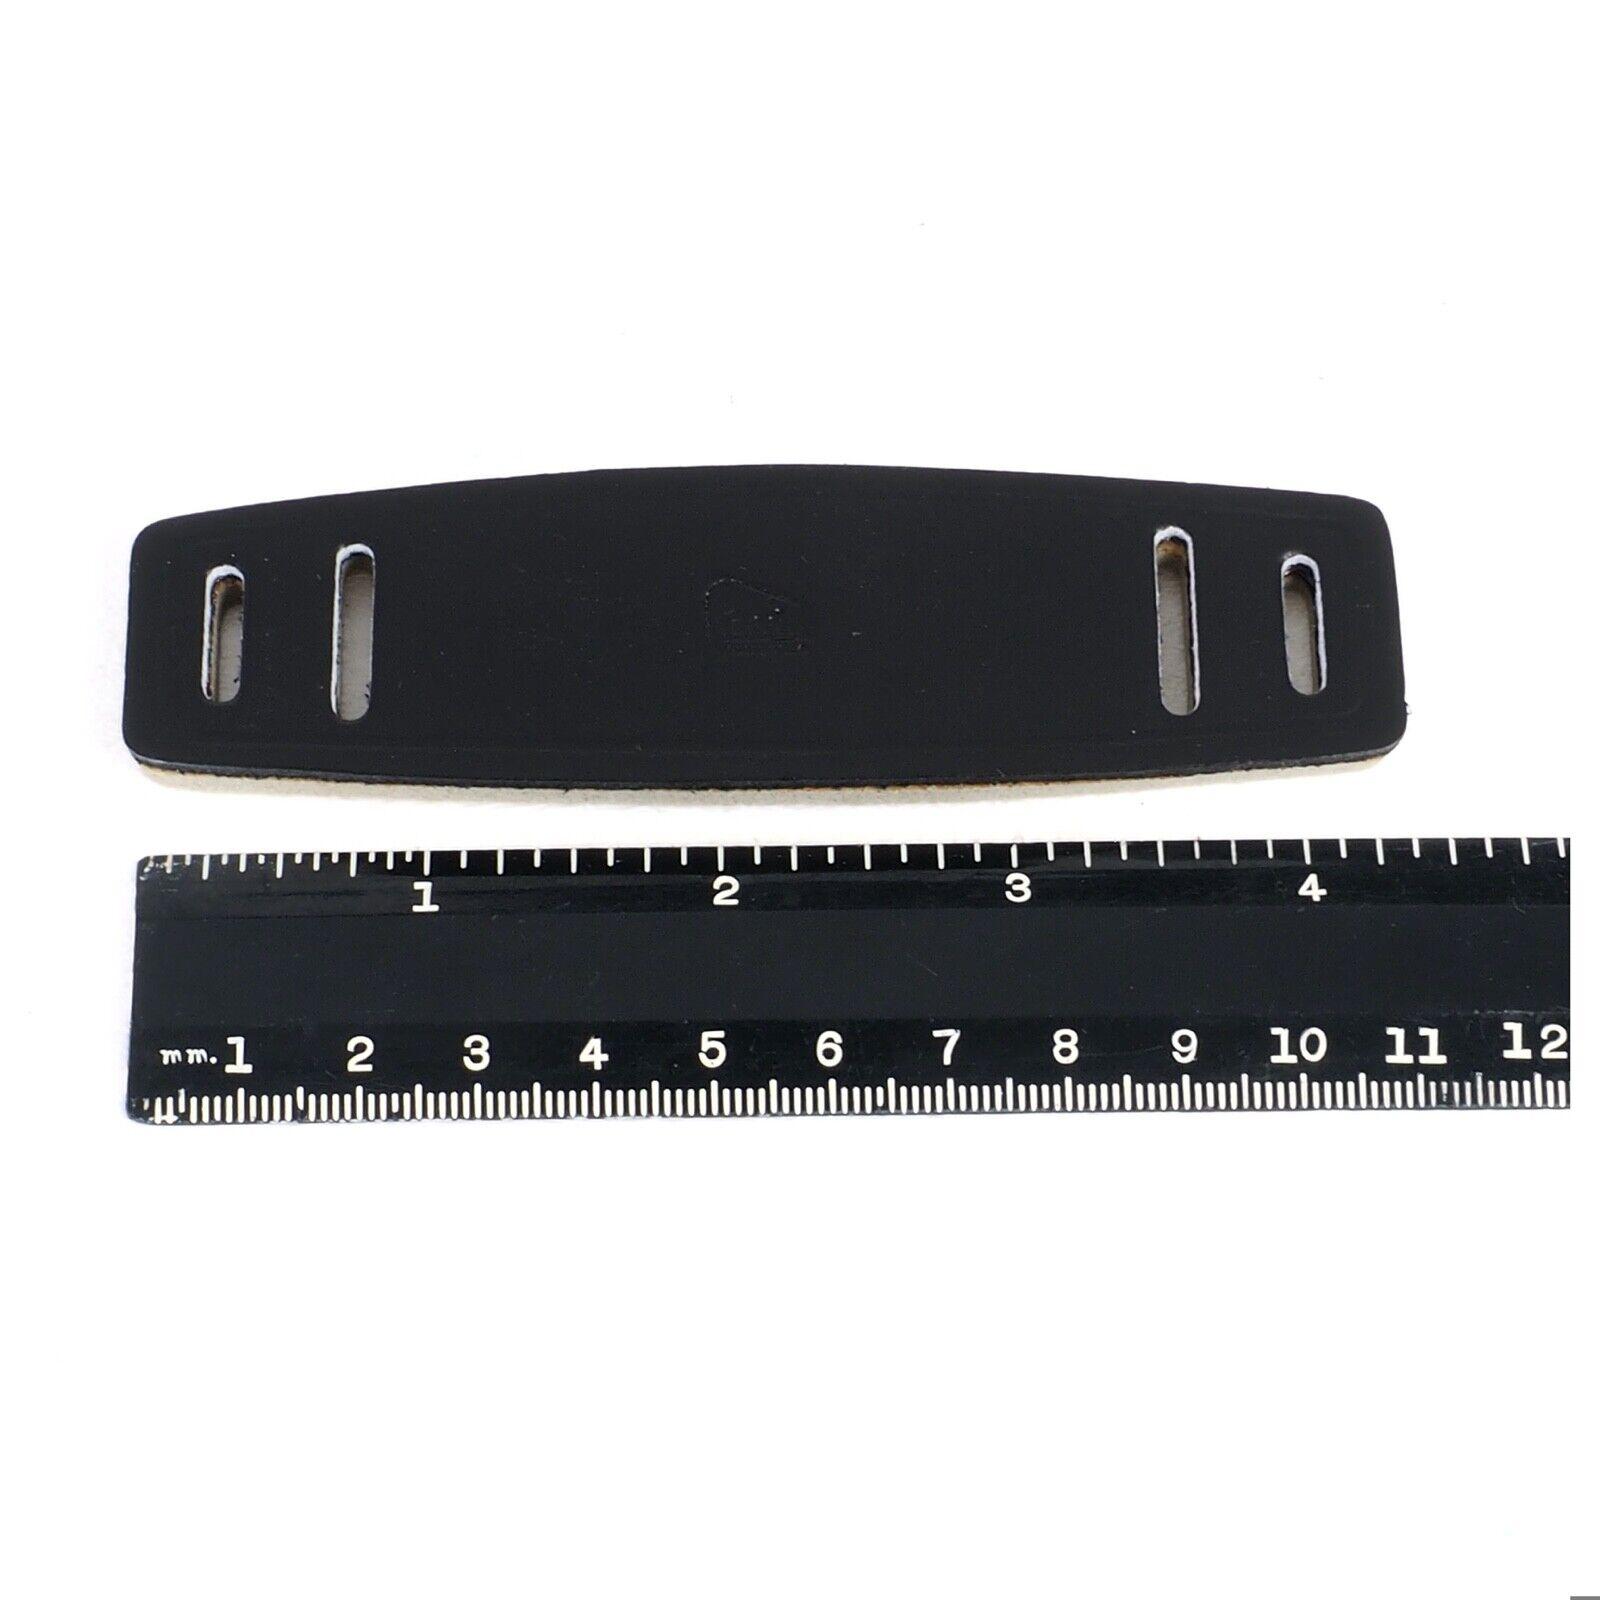 ^ NOS Perrin Black Supple Leather Neck Strap Pads for Cameras, Binoculars etc!